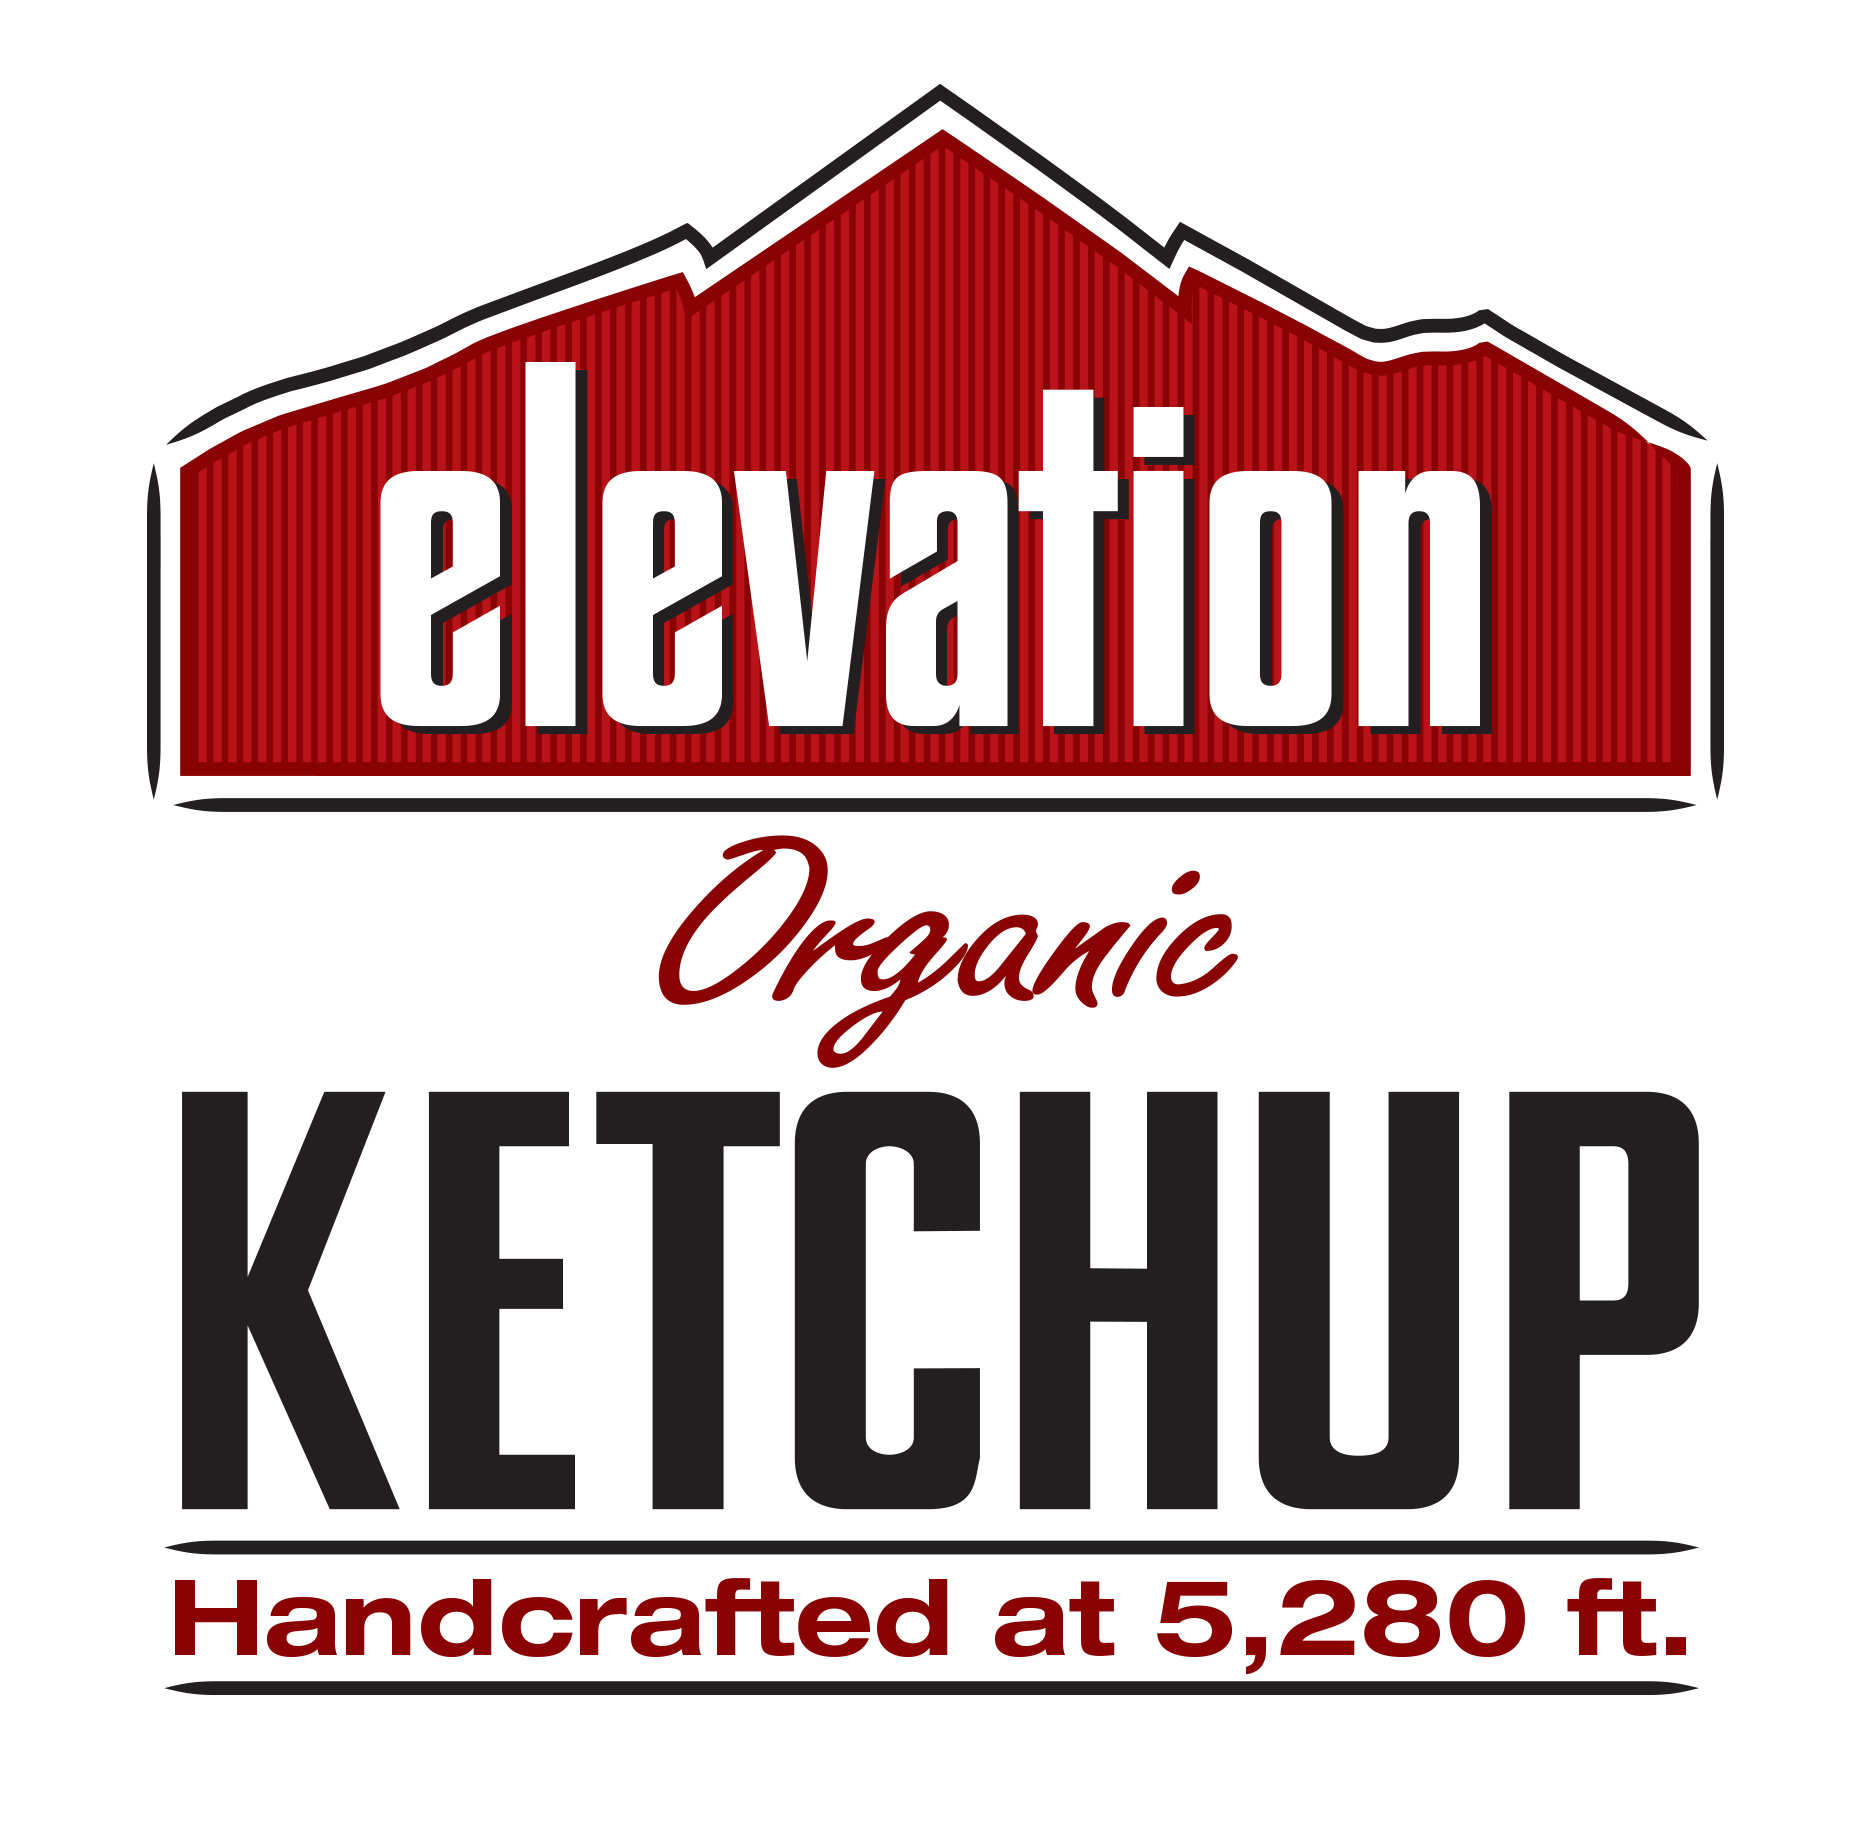 Elevation_Ketchup_Logo_4C_on_white